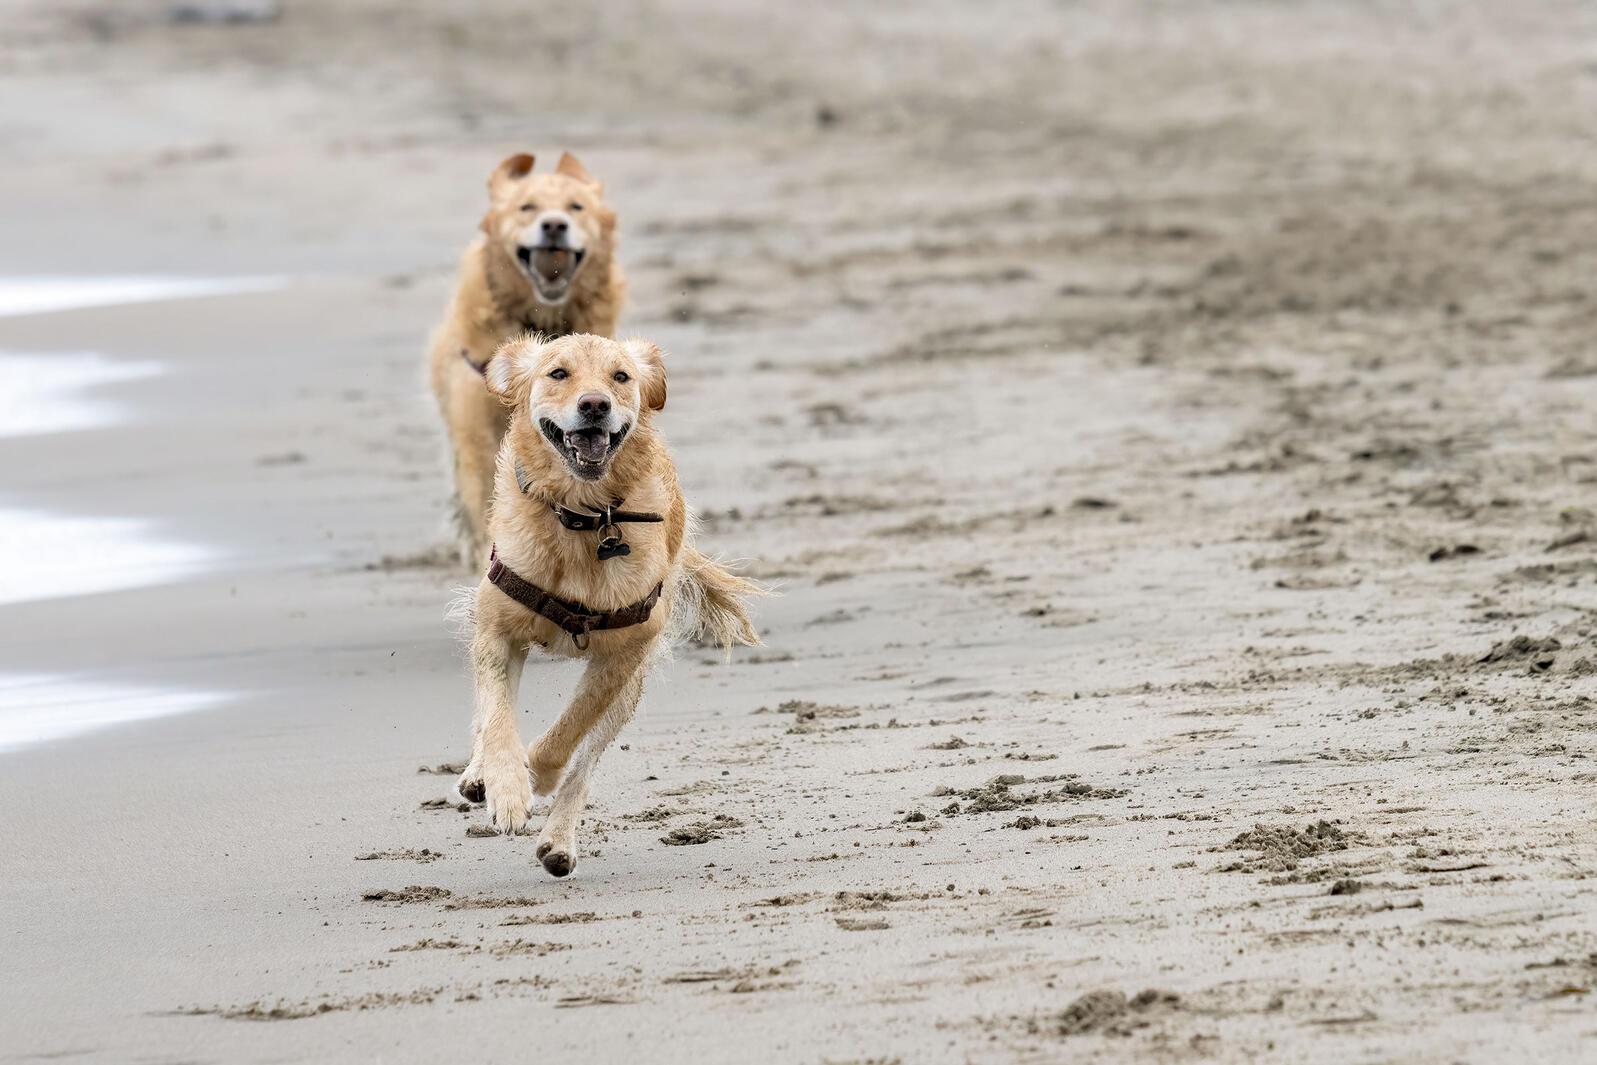 Dogs run off-leash on a beach in California. Tim Fleming/Alamy